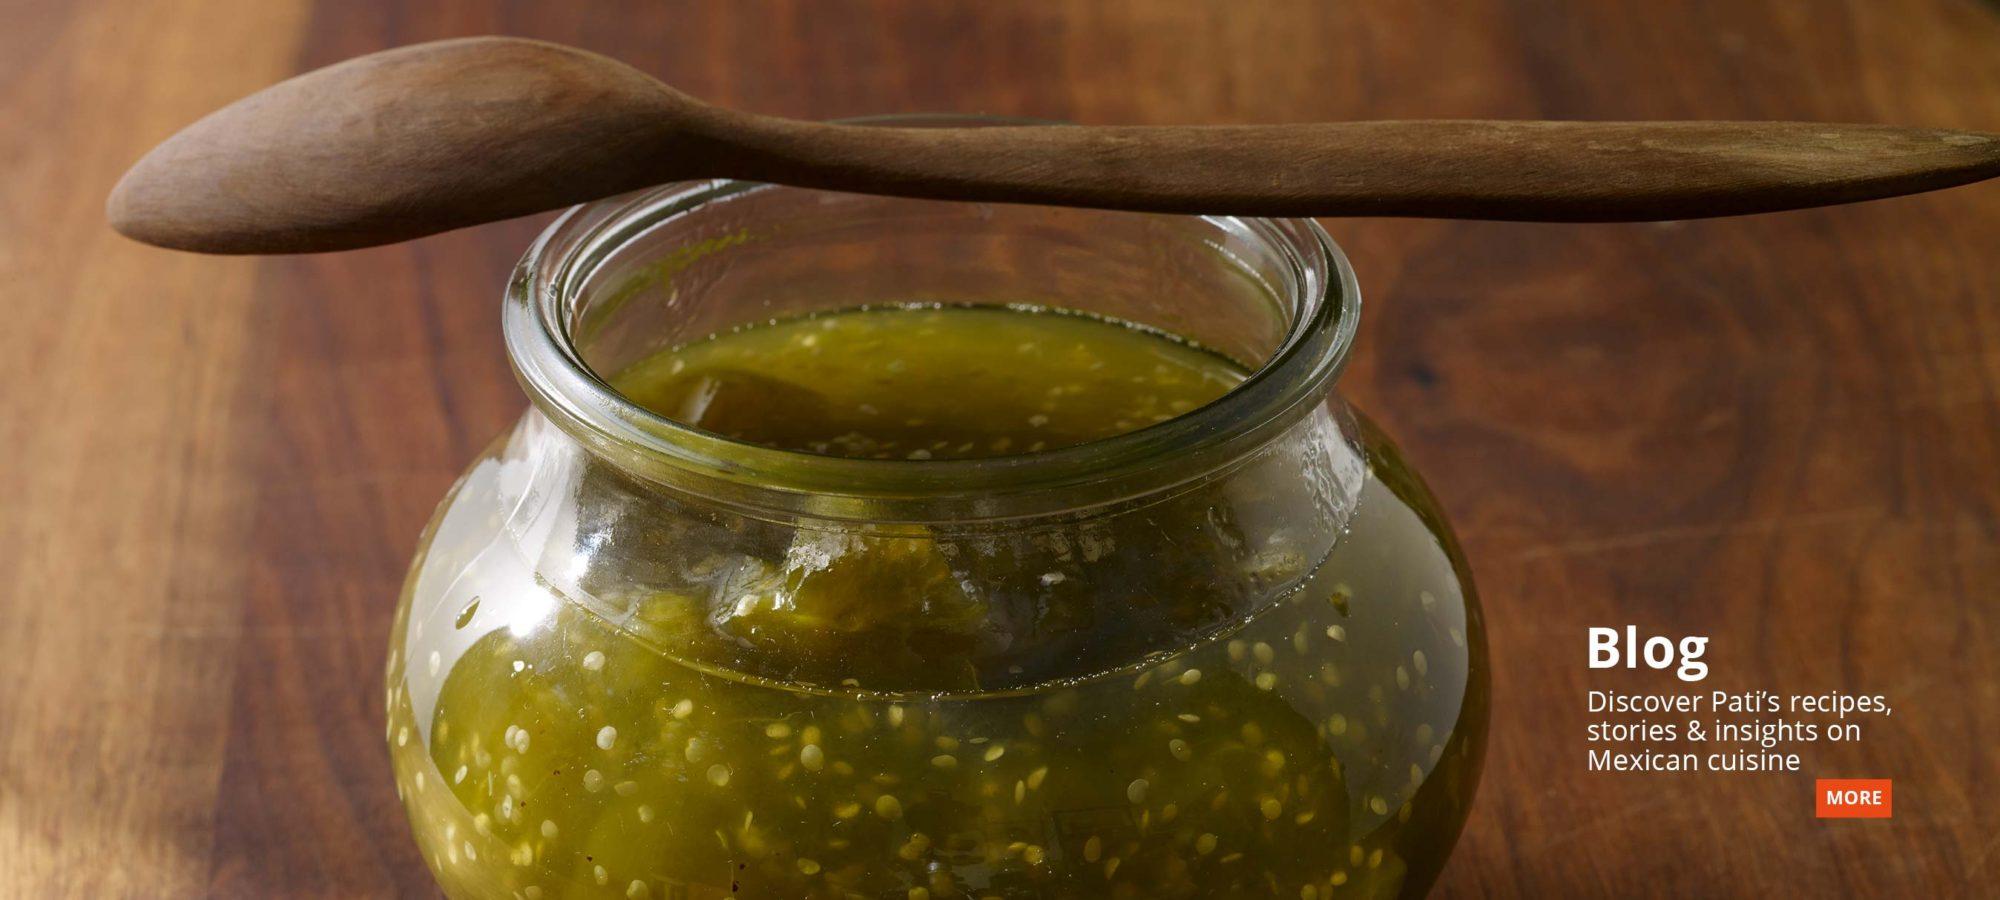 Pati Jinich Mexican Food Recipe Blog